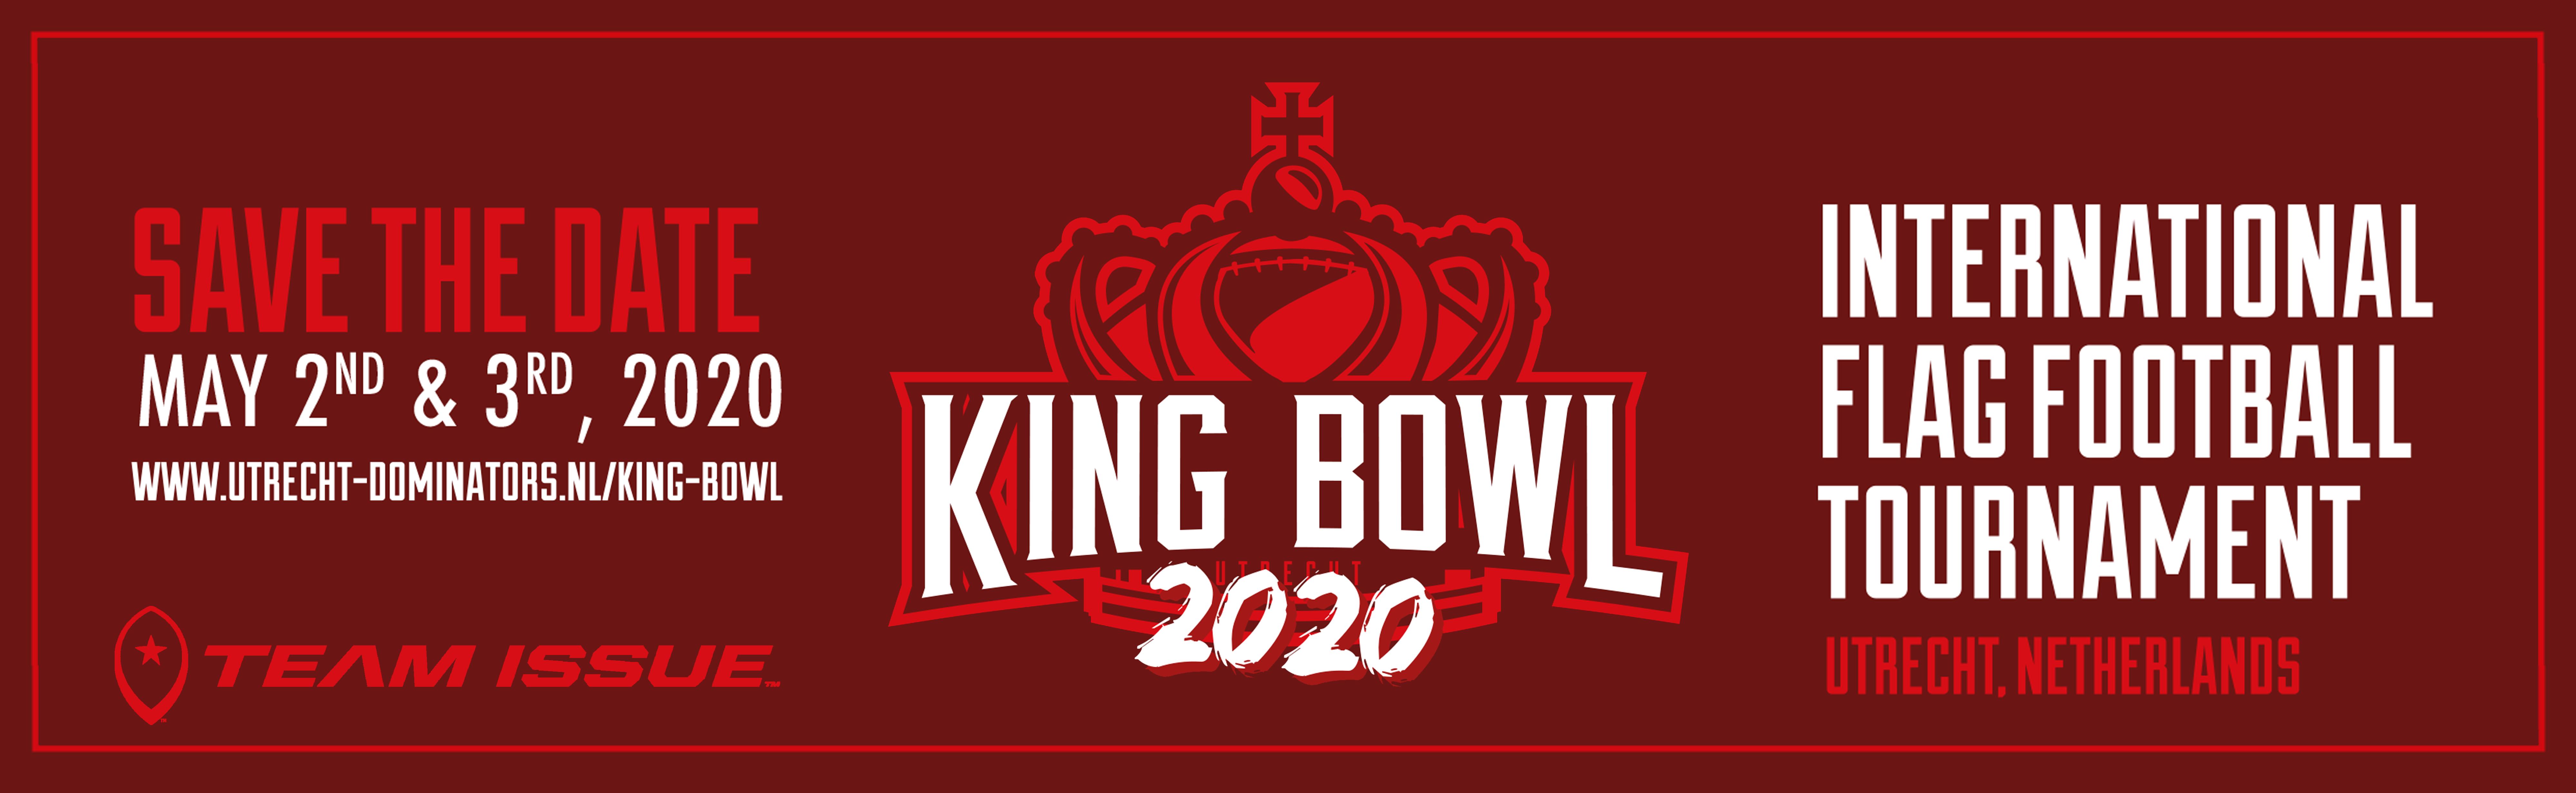 King Bowl 2020 header